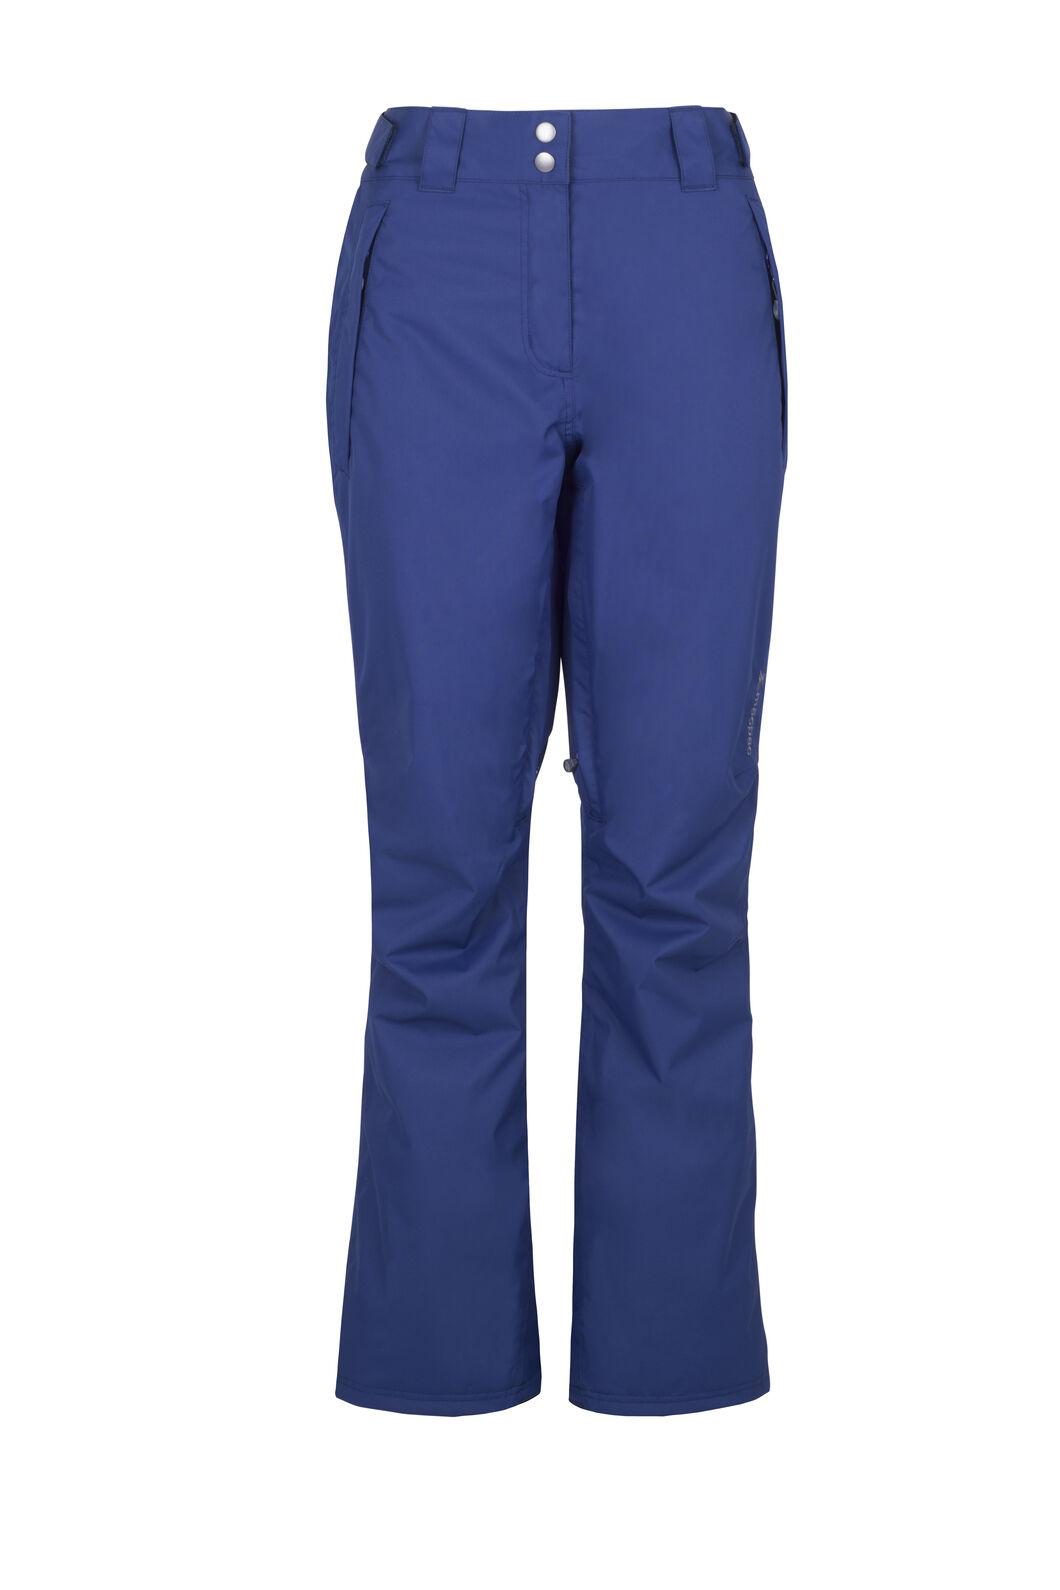 Macpac Powder Ski Pants - Women's, Medieval Blue, hi-res